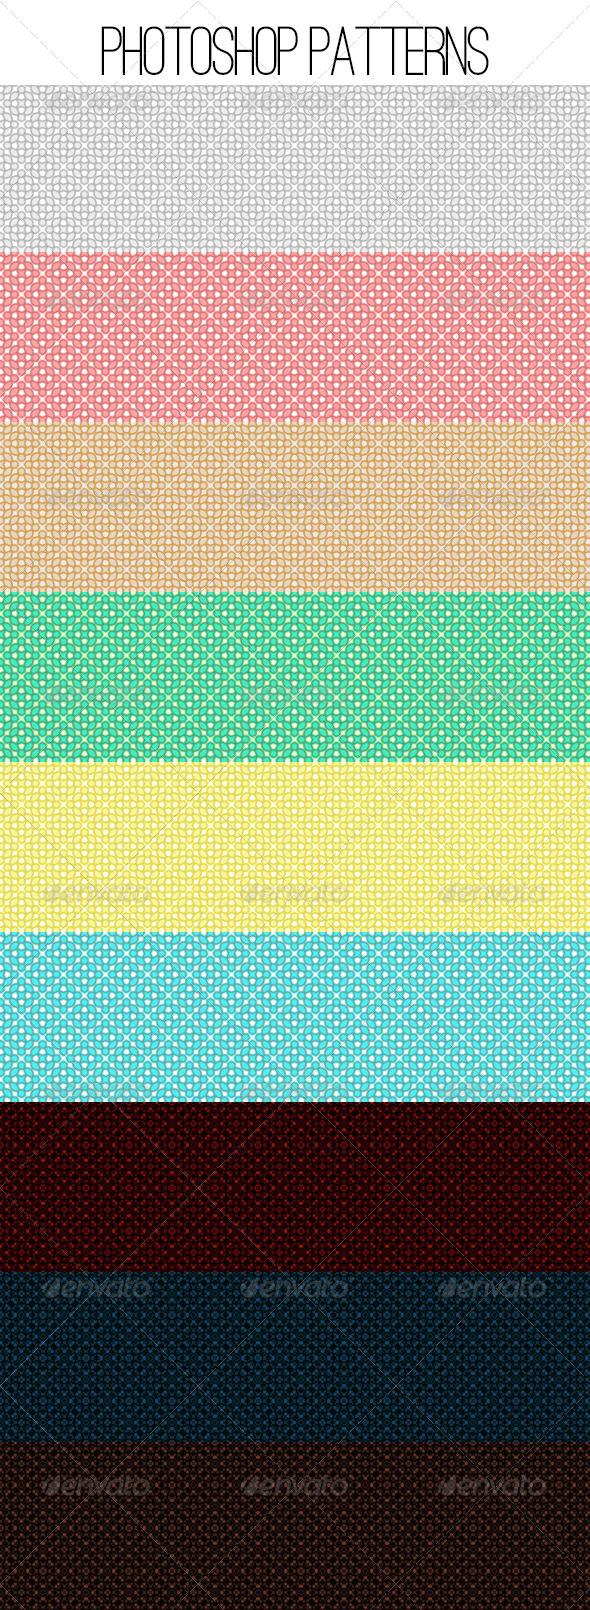 GraphicRiver Simple Photoshop Patterns 5242711